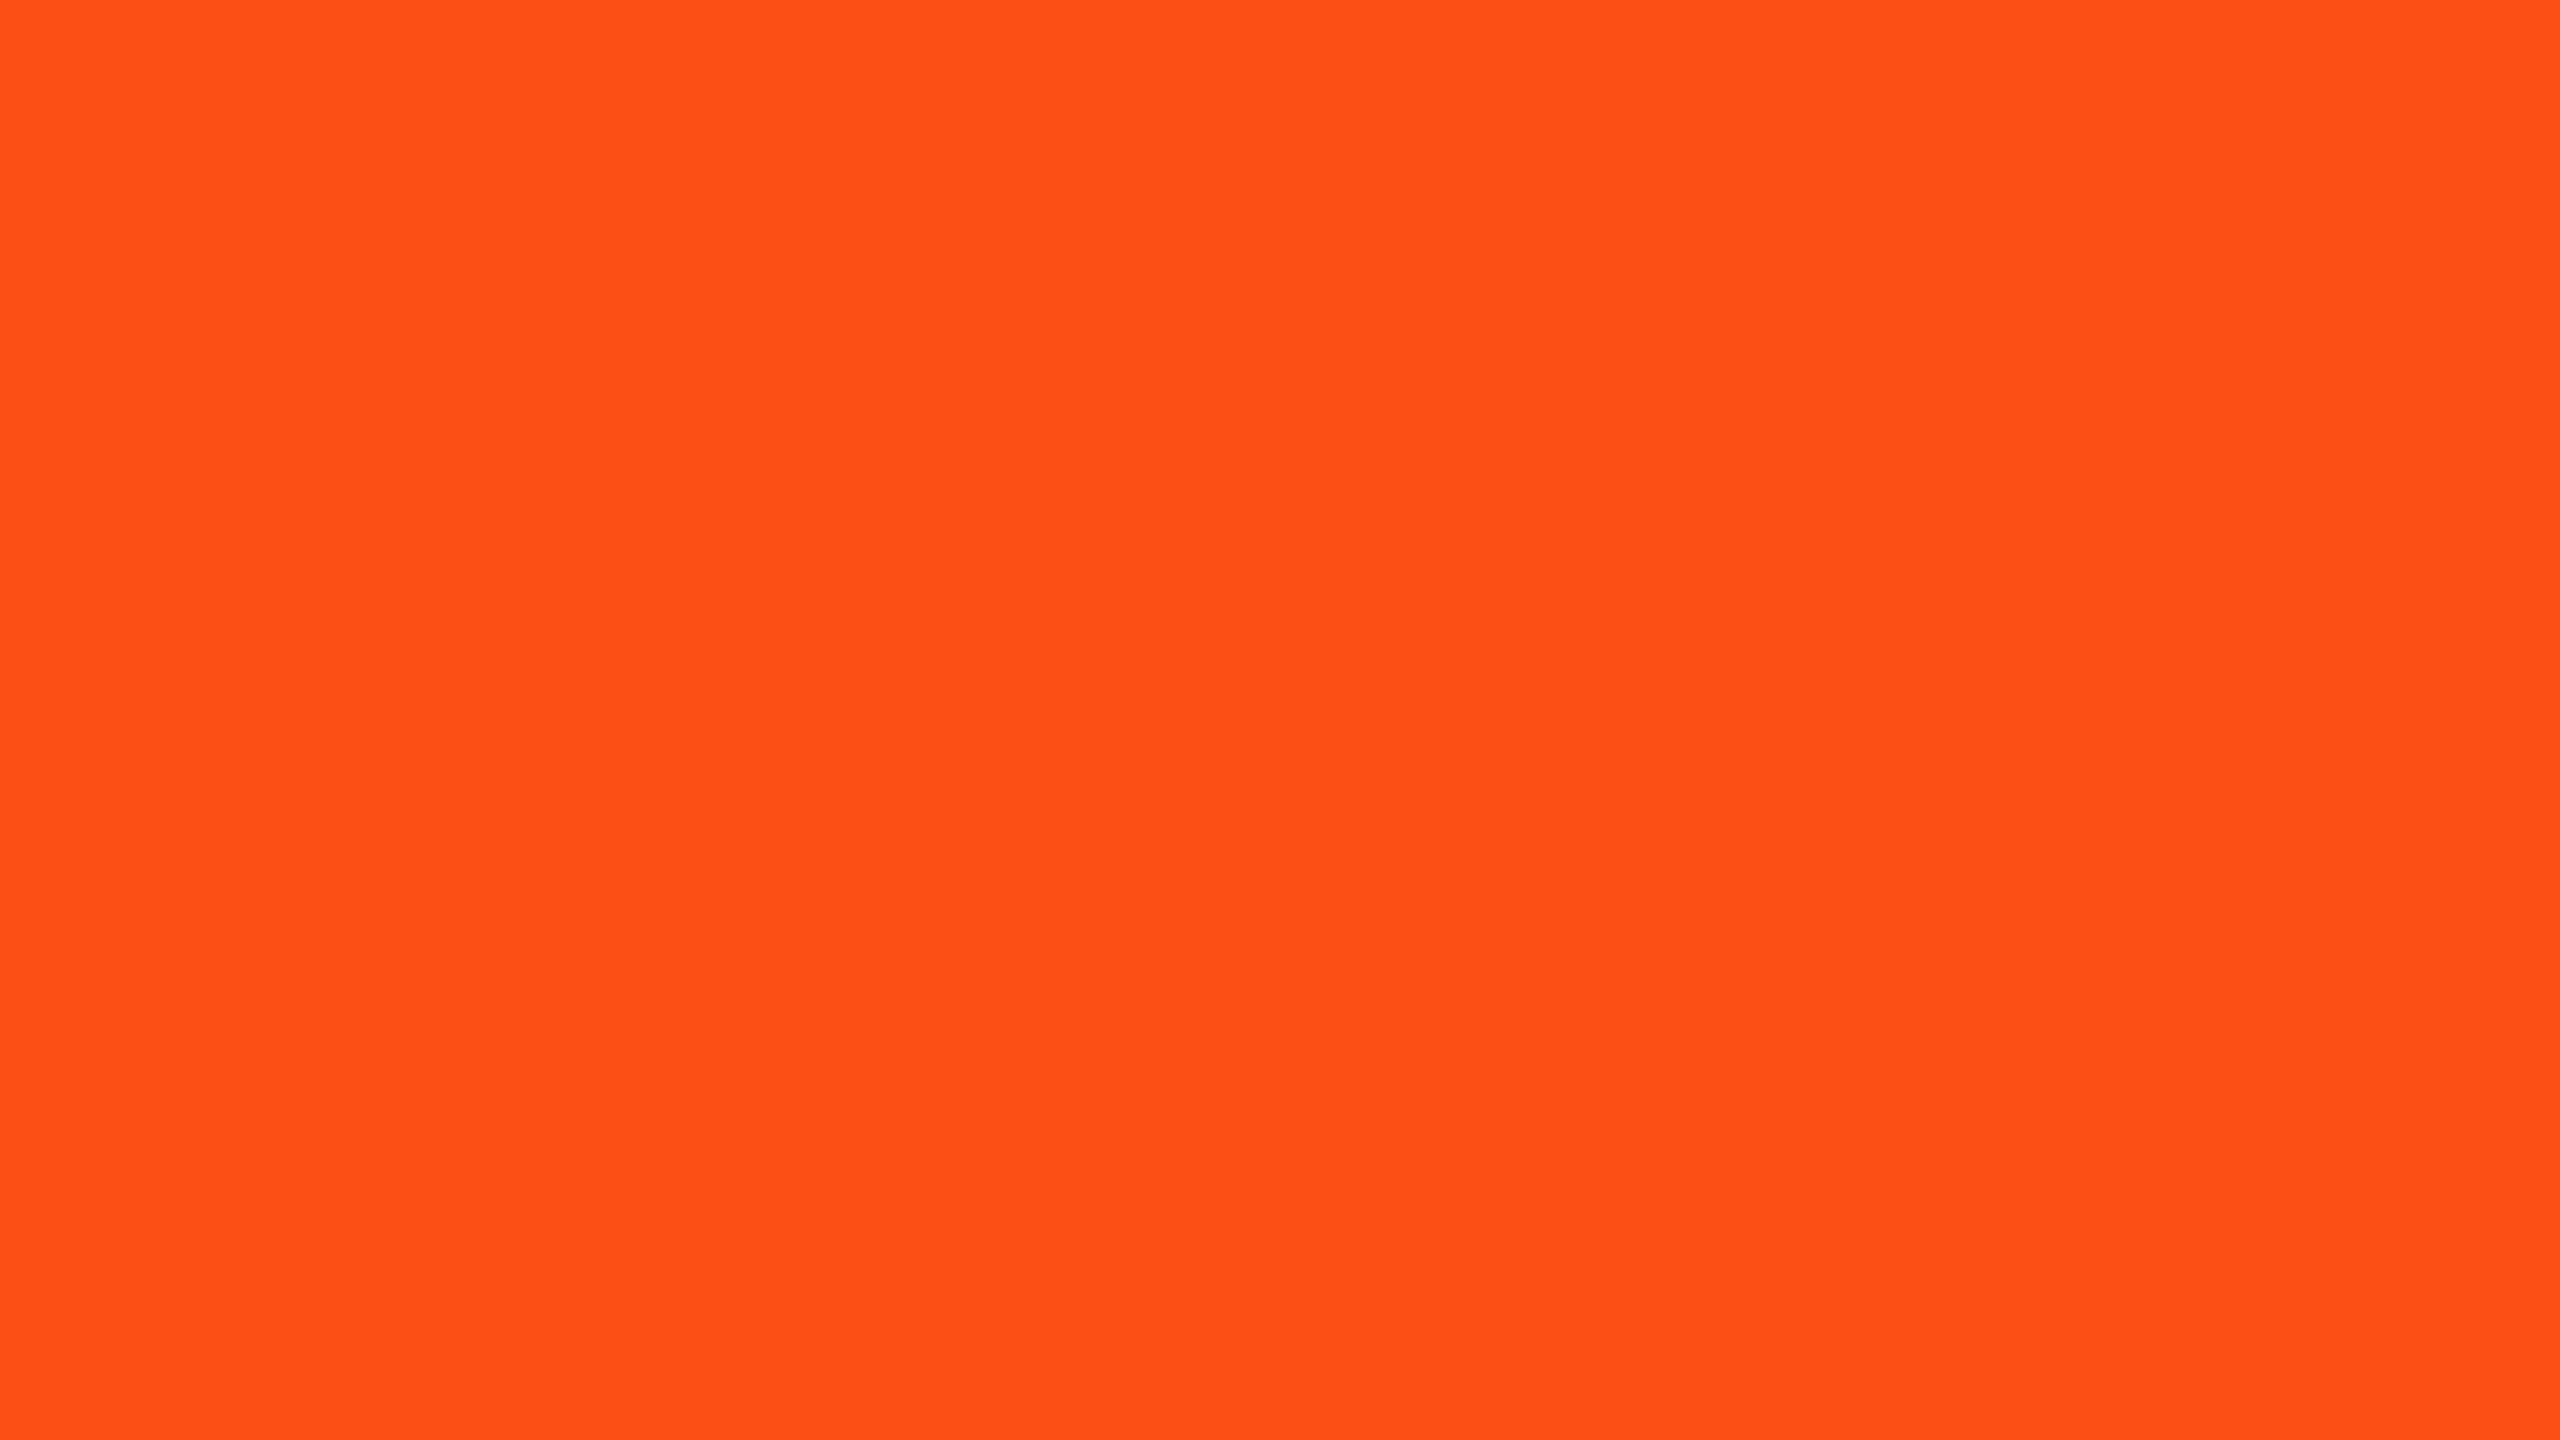 background color solid orange orioles images 2560x1440 2560x1440